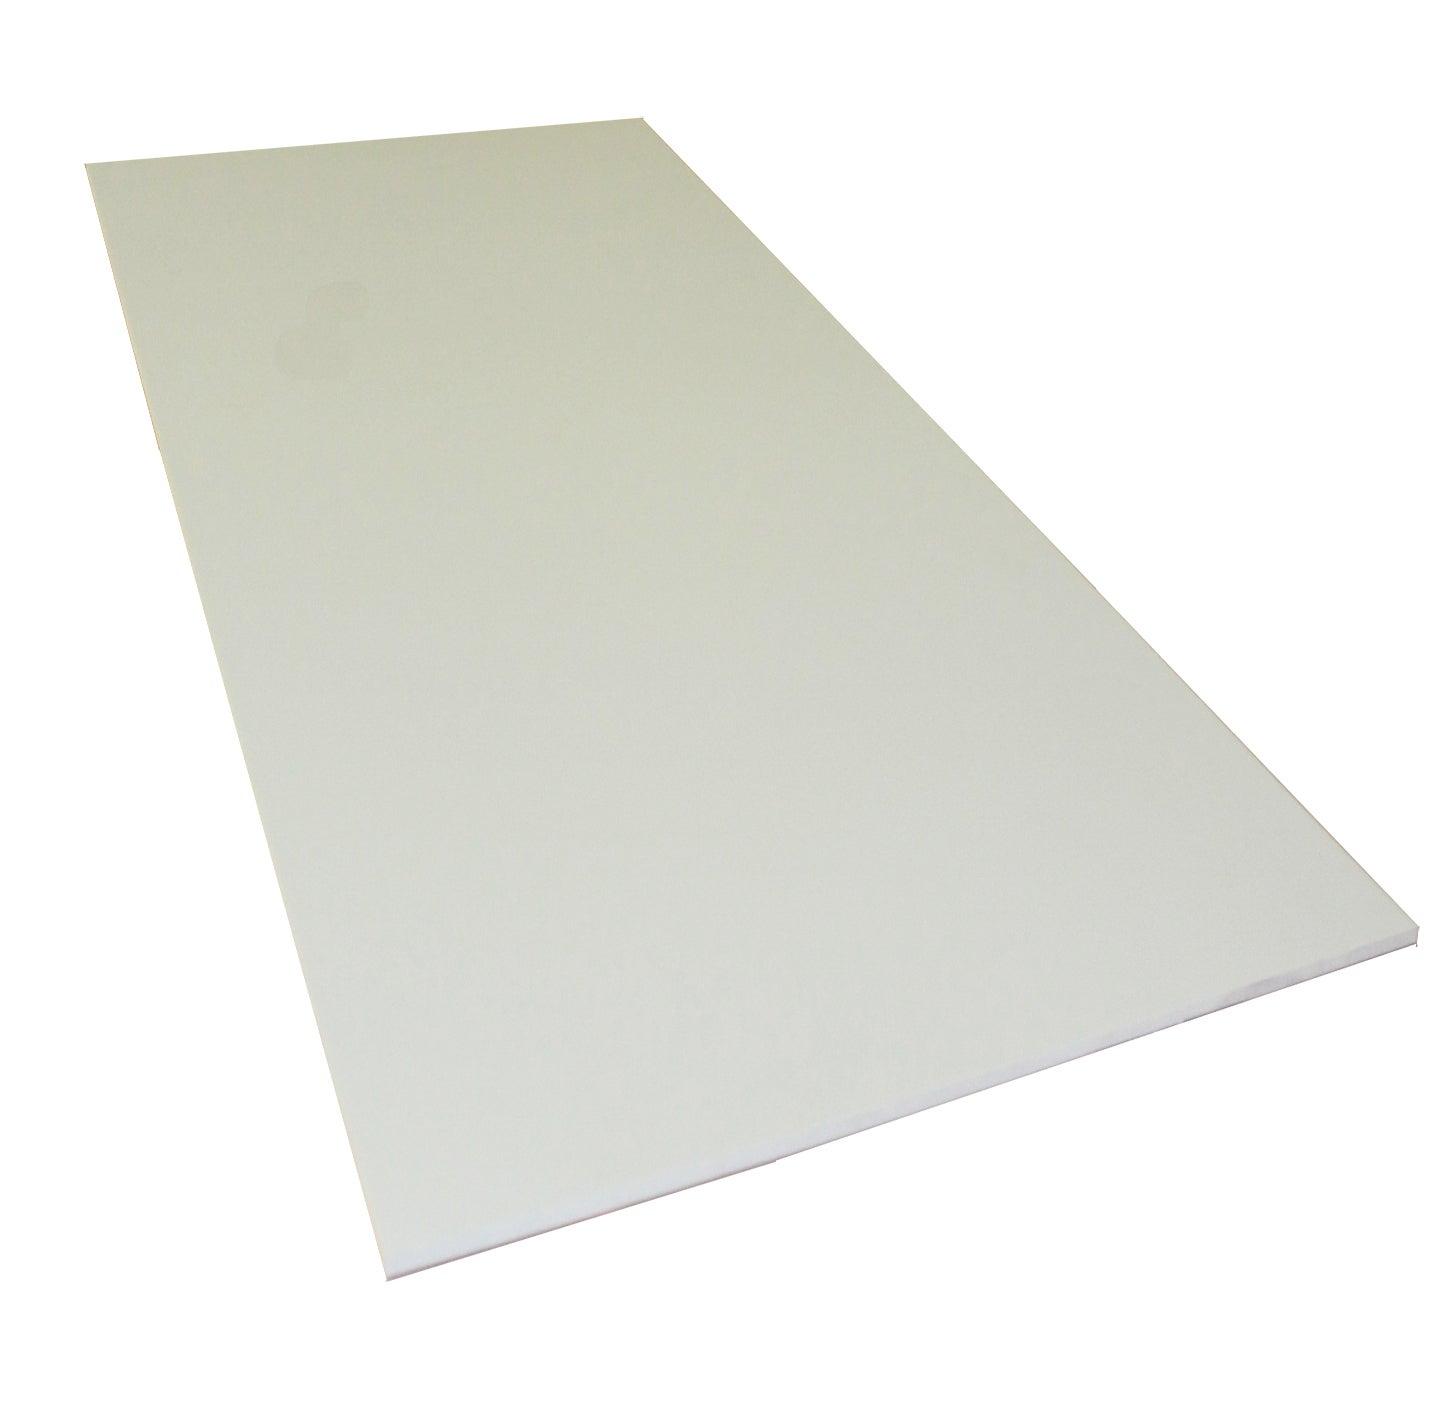 blanc Plaque coup/é de PE rigide 495 x 495 x 10 mm naturel Poly/éthyl/éne